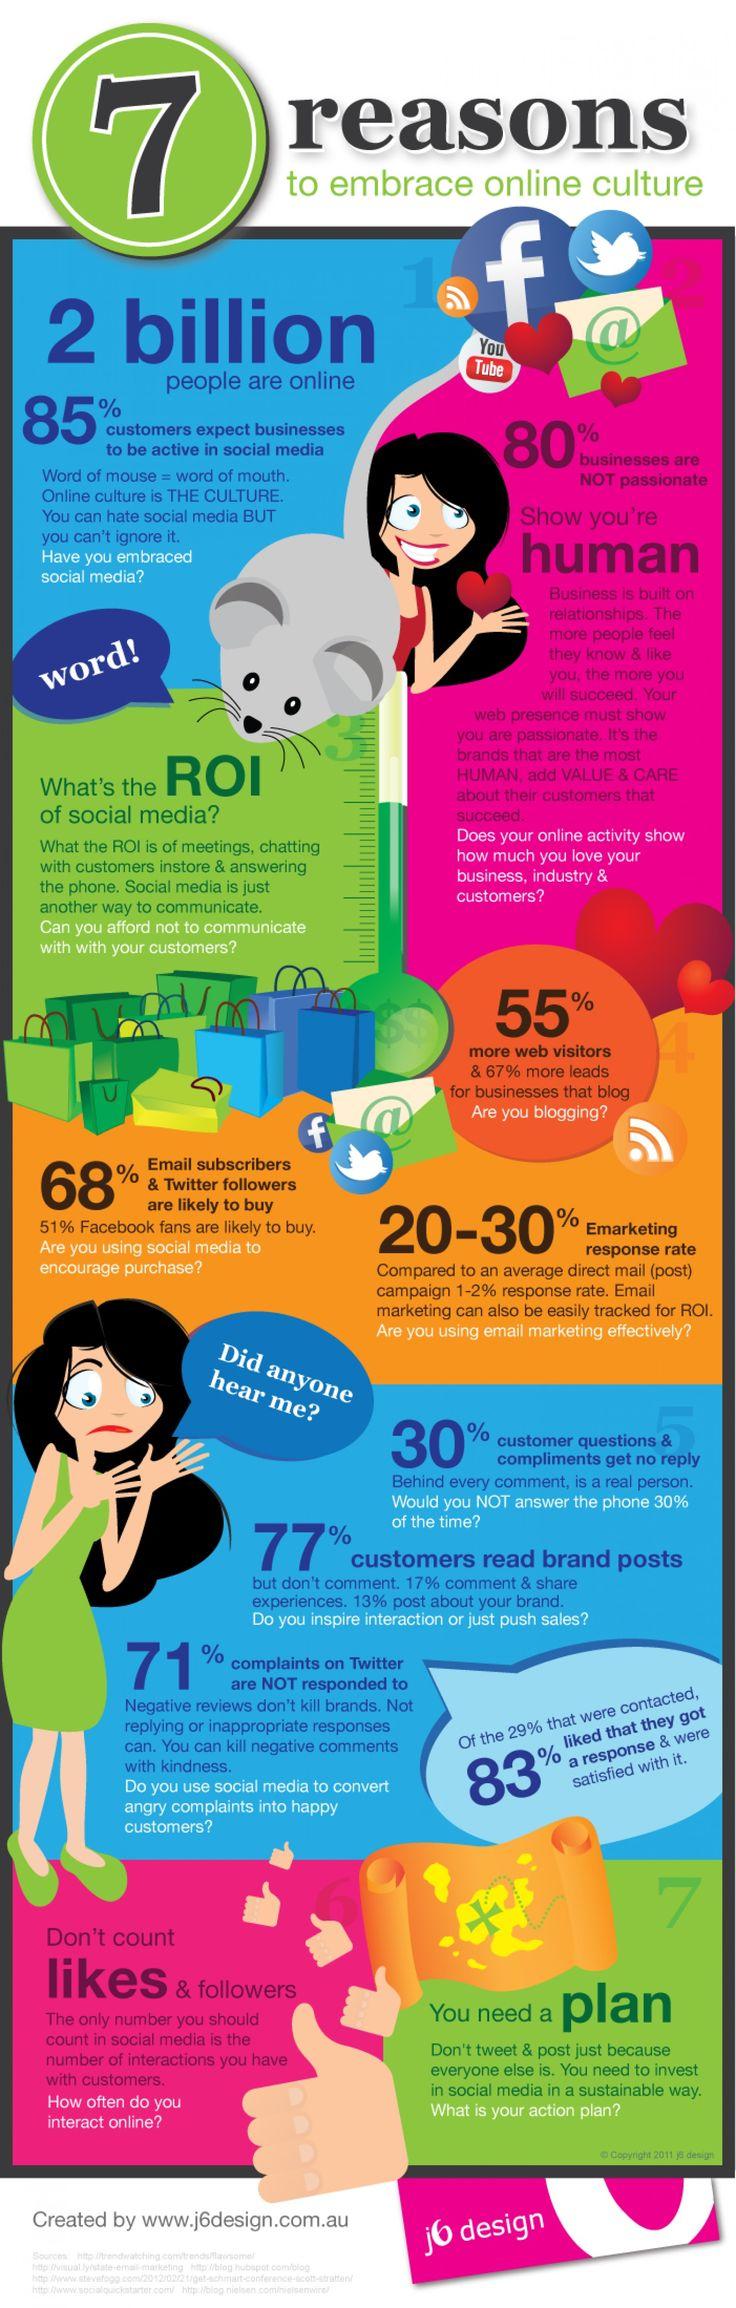 7 reasons to embrace online culture (social media) Infographic #SocialMedia